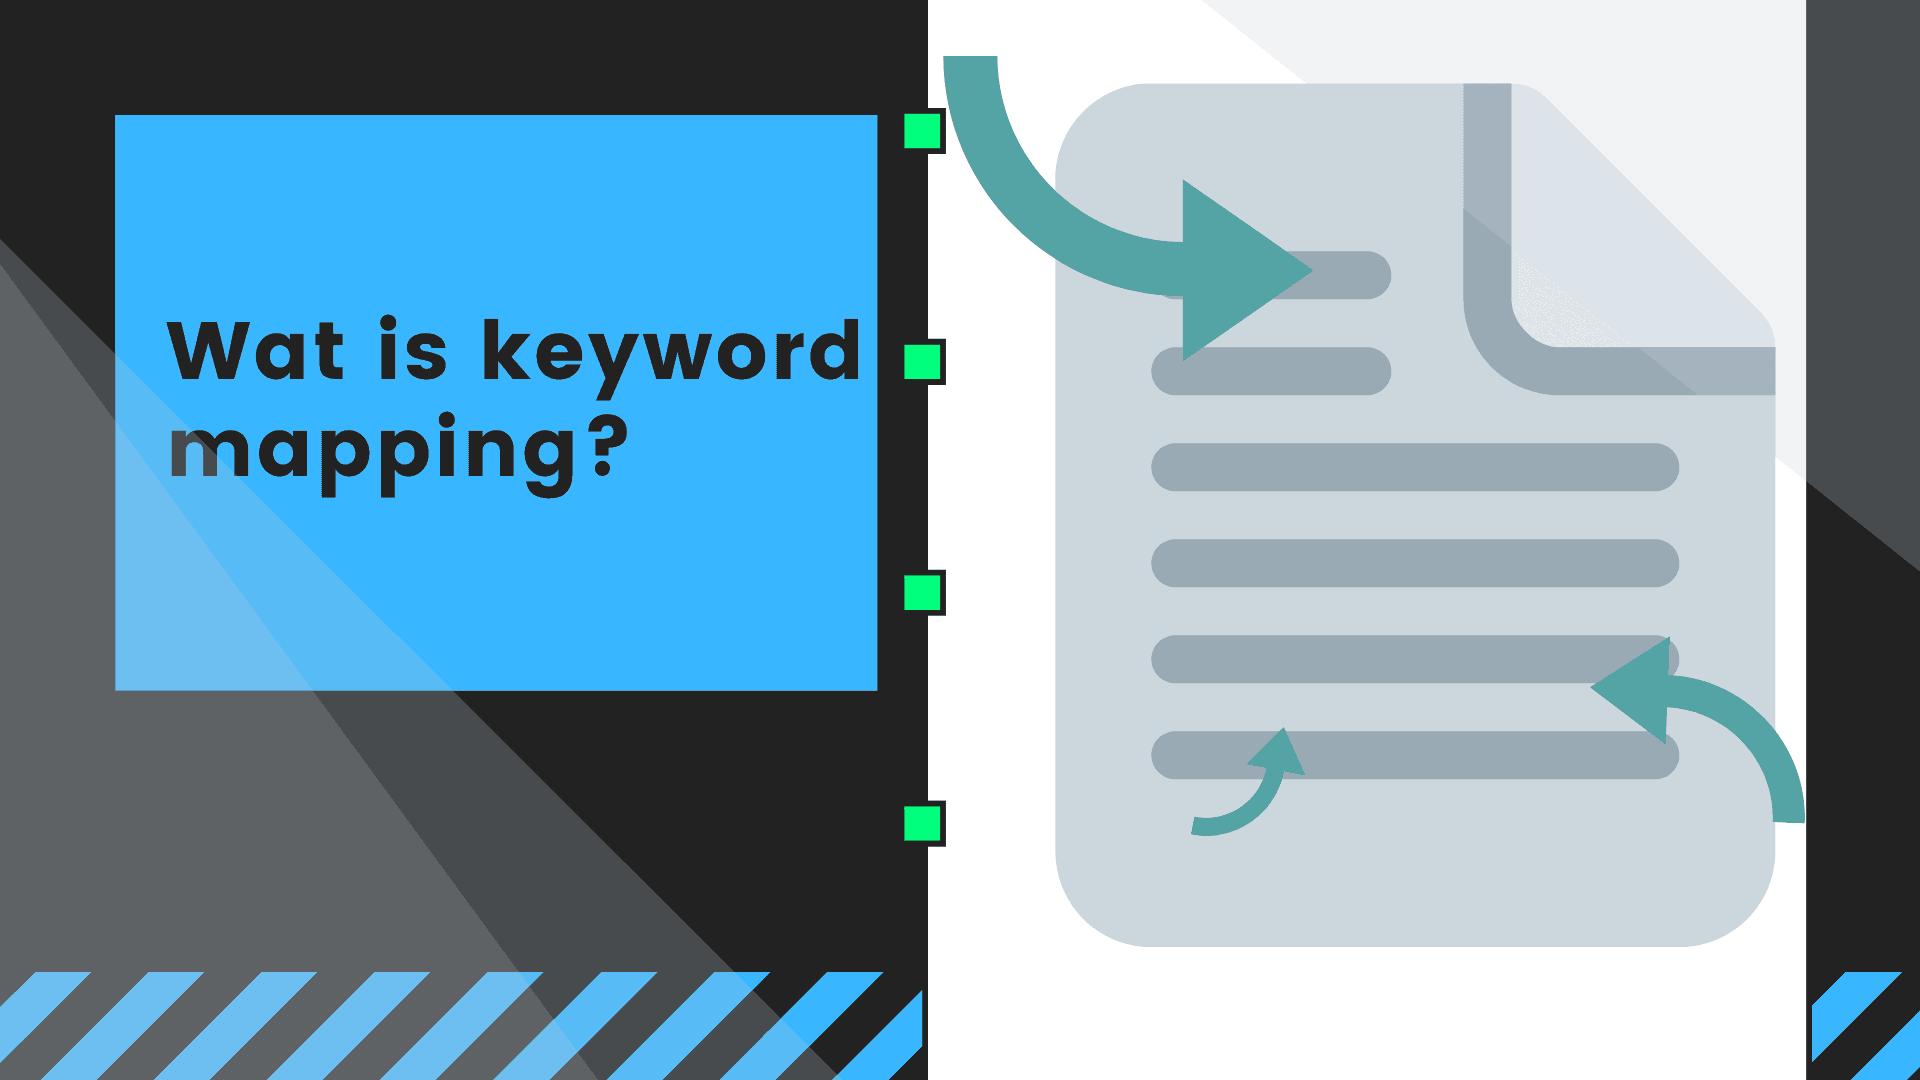 wat is keyword mapping